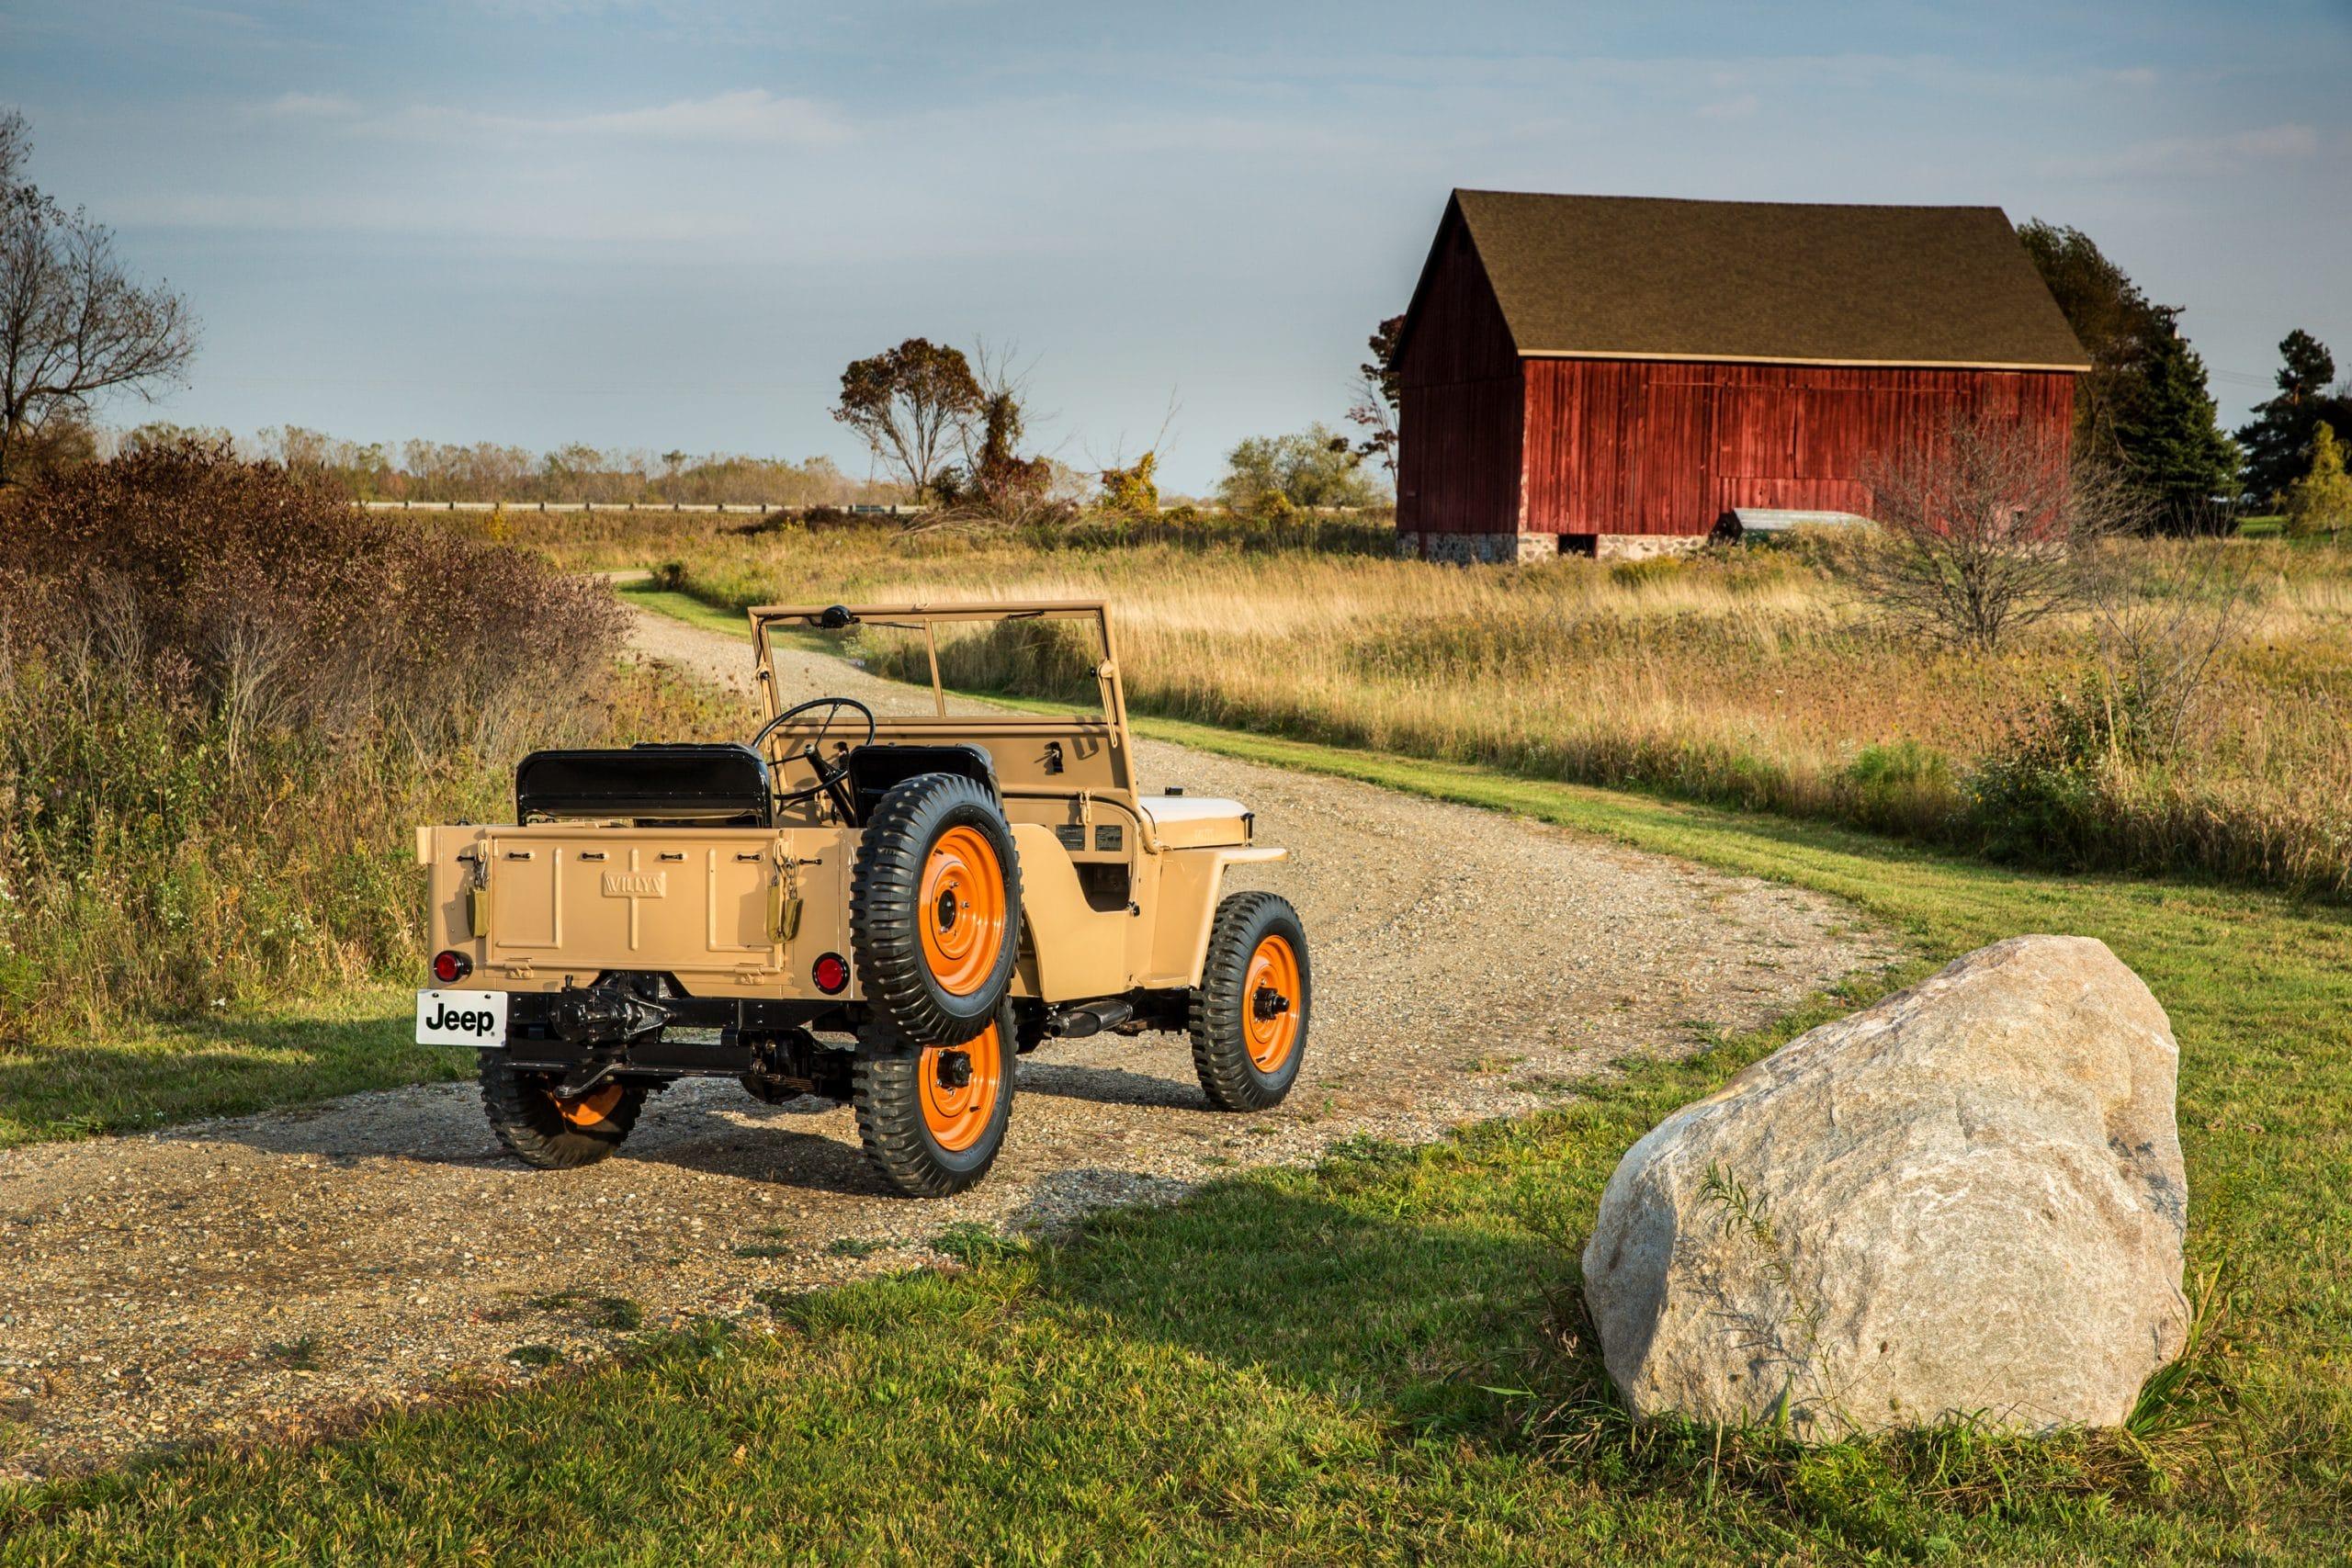 01 11th moment 1945 CJ2A scaled 12 ορόσημα, για τα 80α γενέθλια της Jeep Jeep, Jeep Cherokee, Jeep Compass, Jeep Gladiator, Jeep Grand Cherokee, Jeep Renegade, Jeep Willys, Jeep Wrangler, ειδήσεις, Νέα